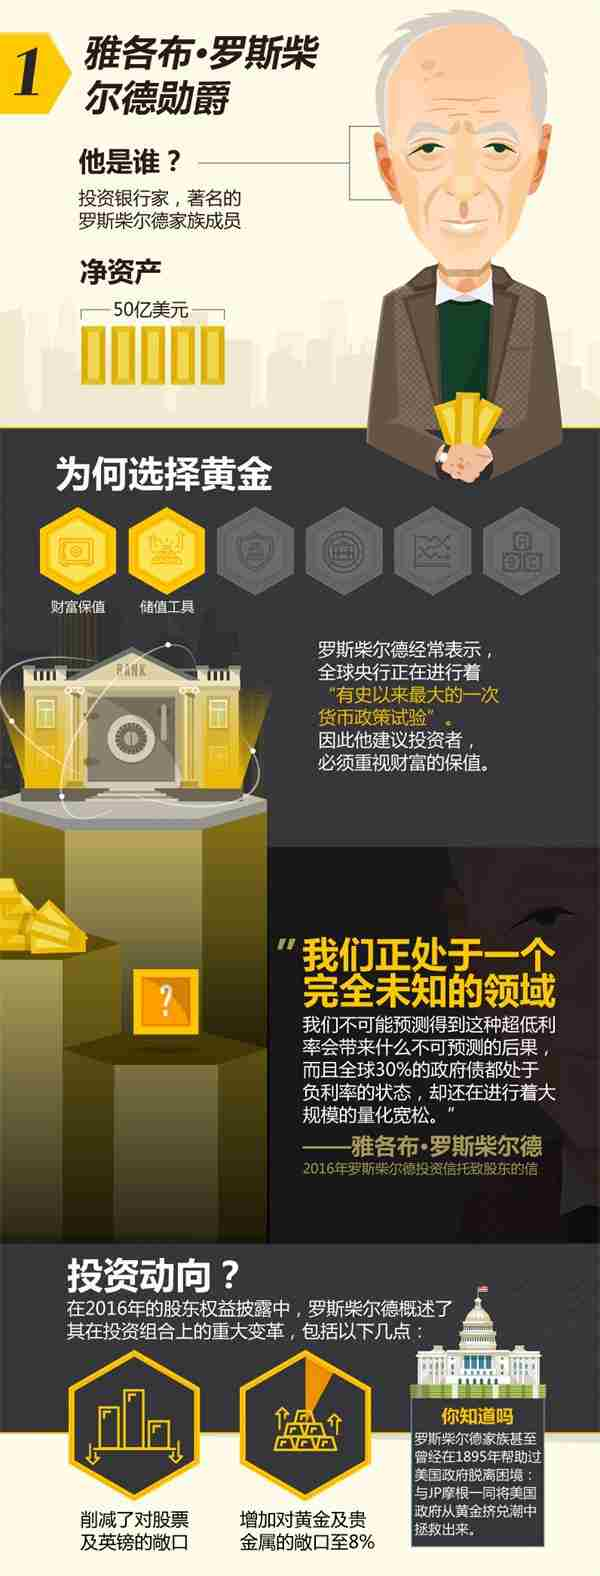 billionaires-precious-metals1.jpg